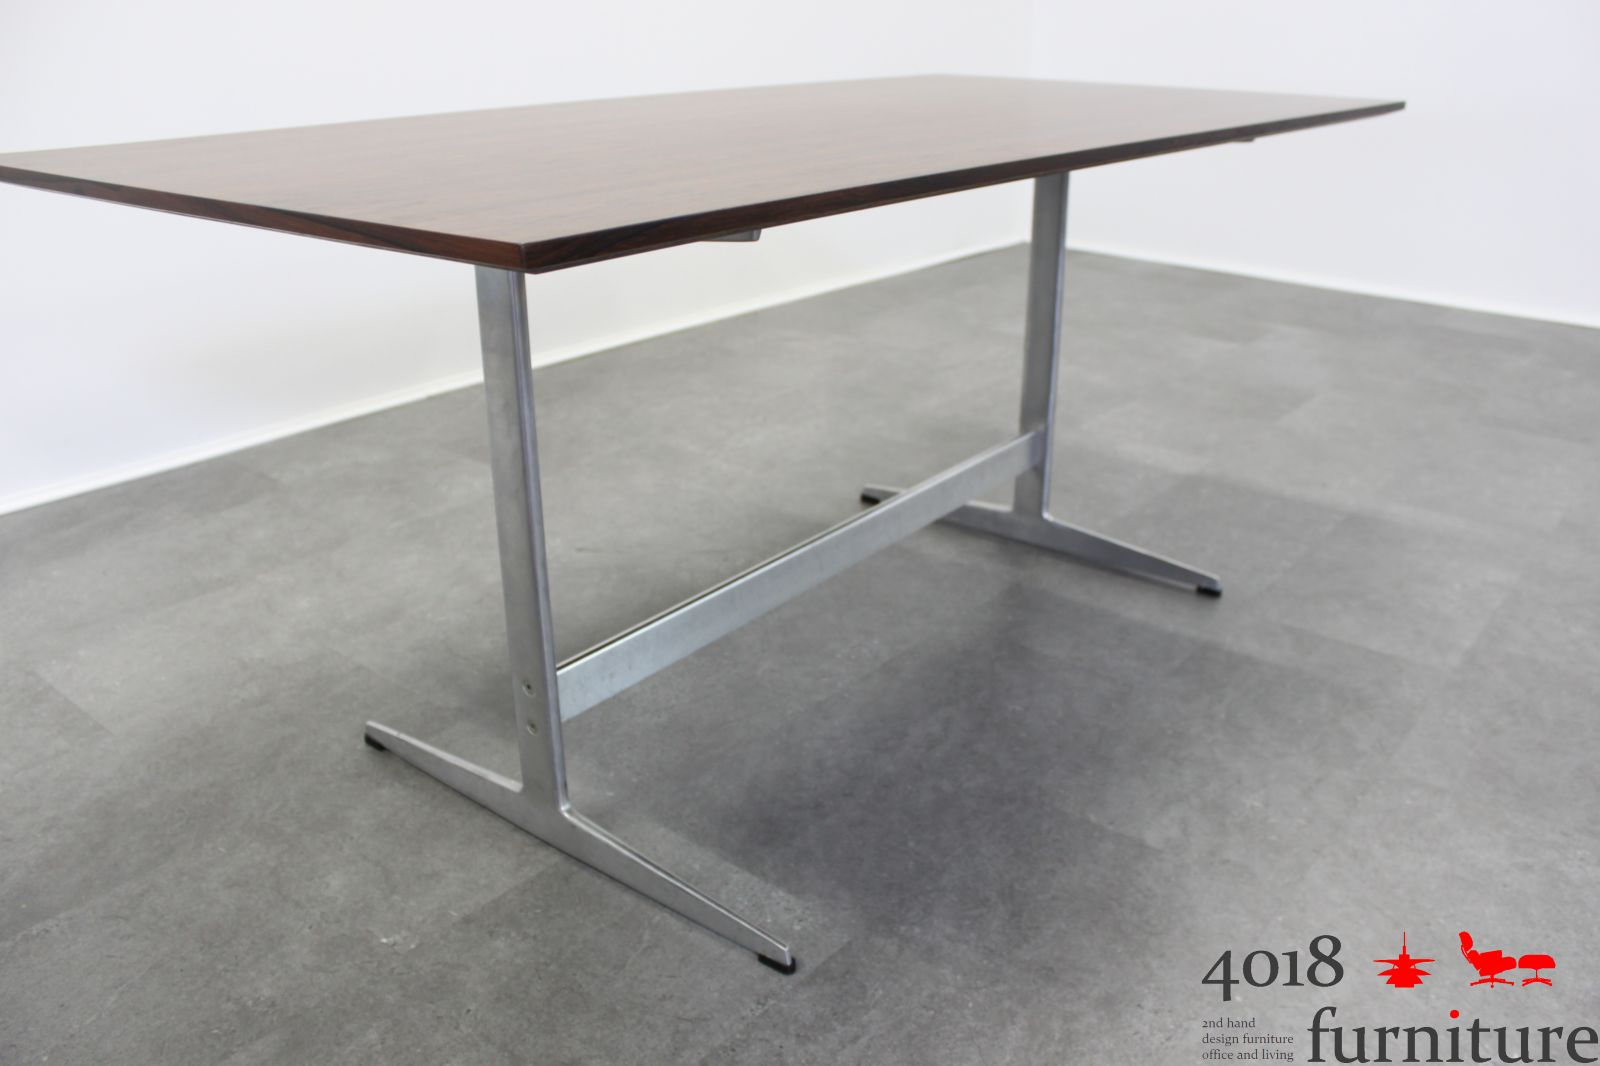 arne jacobsen shaker table fritz hansen palisander platte. Black Bedroom Furniture Sets. Home Design Ideas